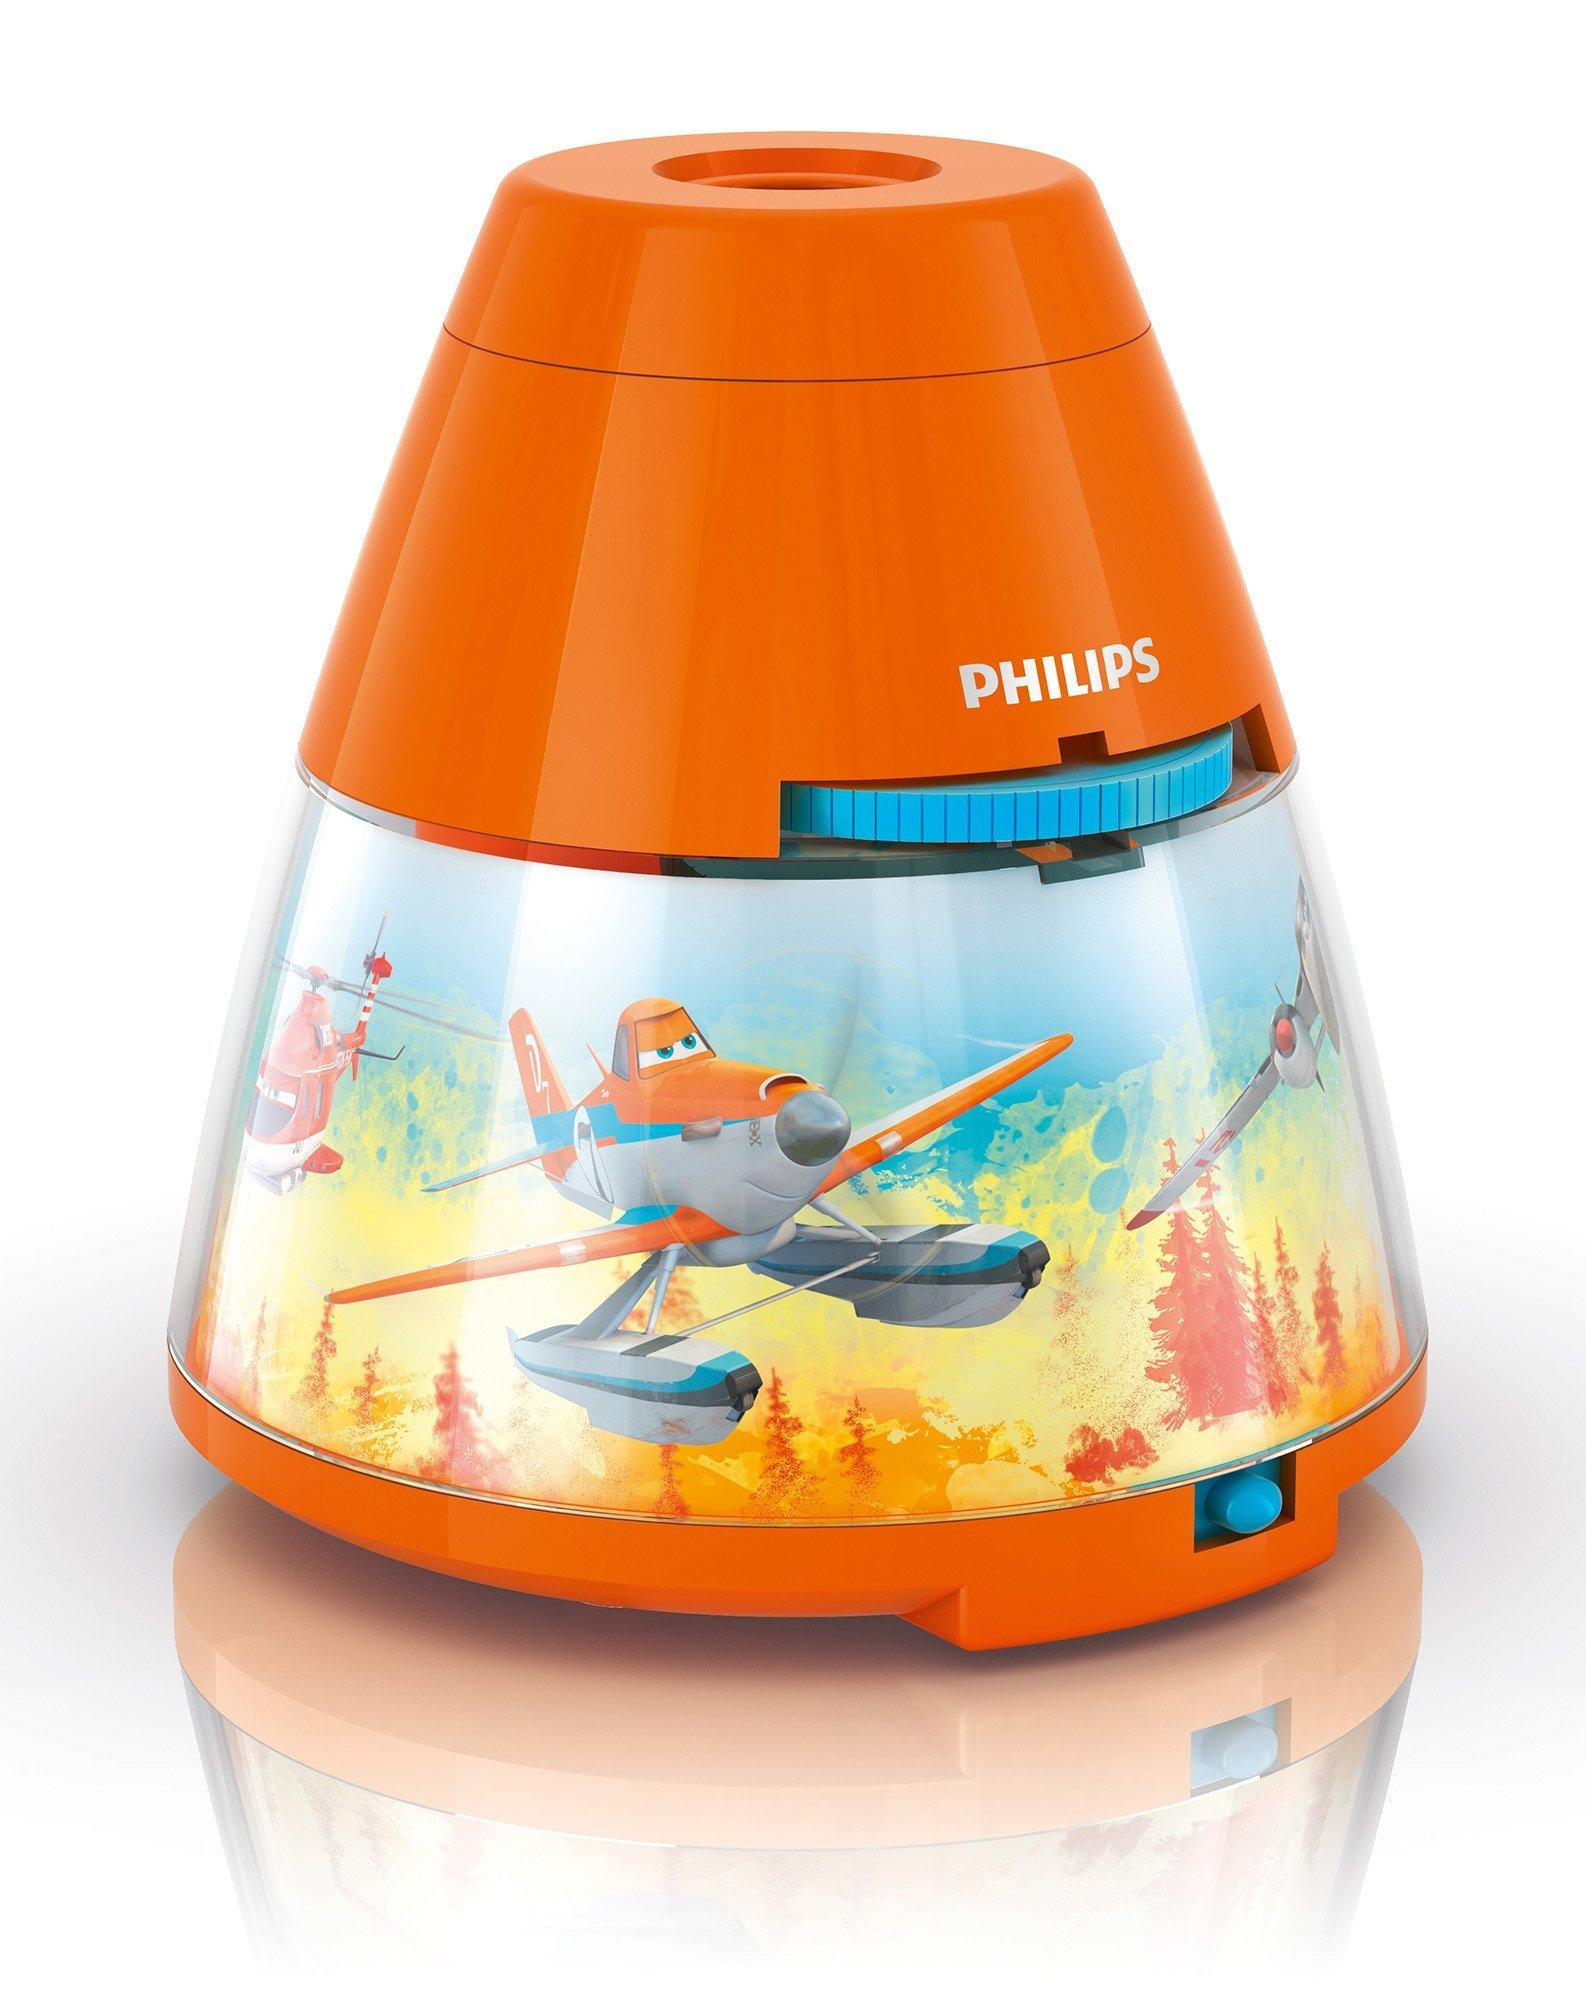 Philips 708000000 1 1 Watt LED Projektor Disney Planes, Orange